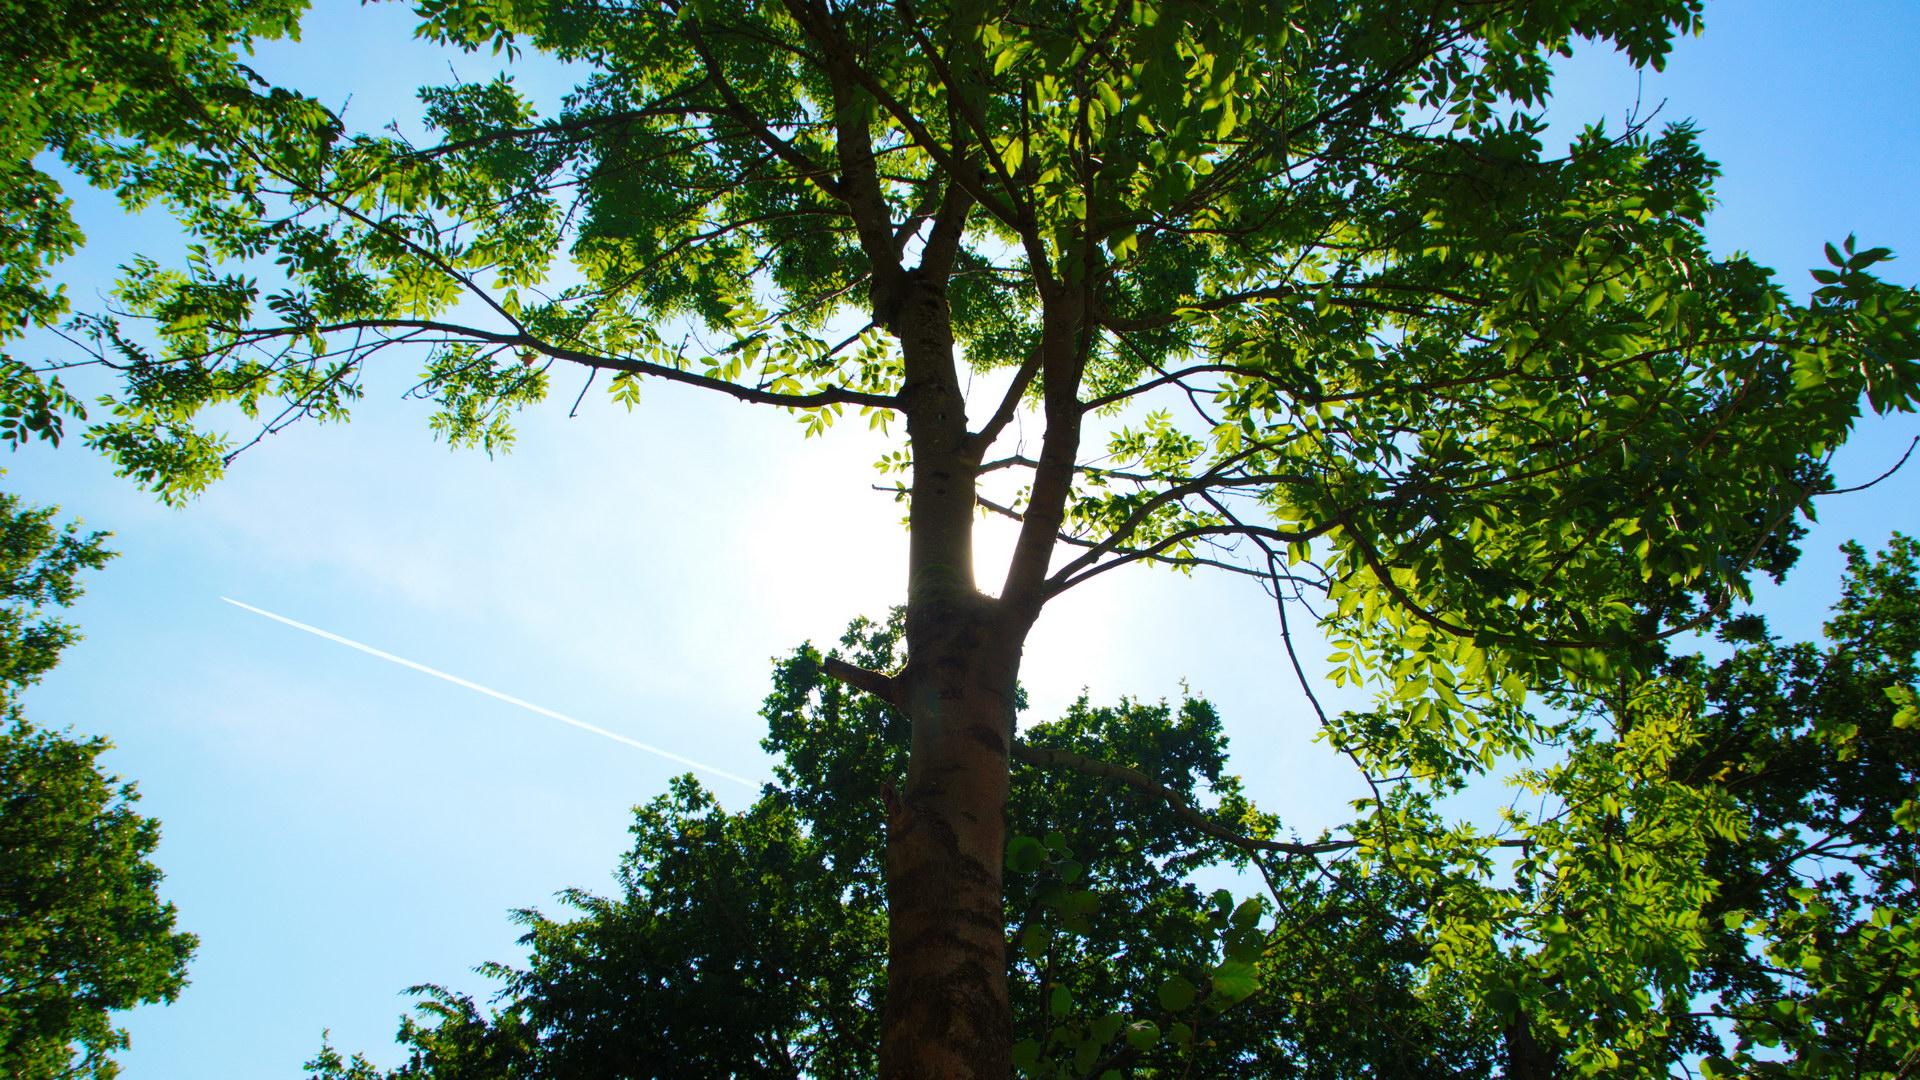 Sonne hinter Baum Grün leuchtende Blätter Blauer Himmel